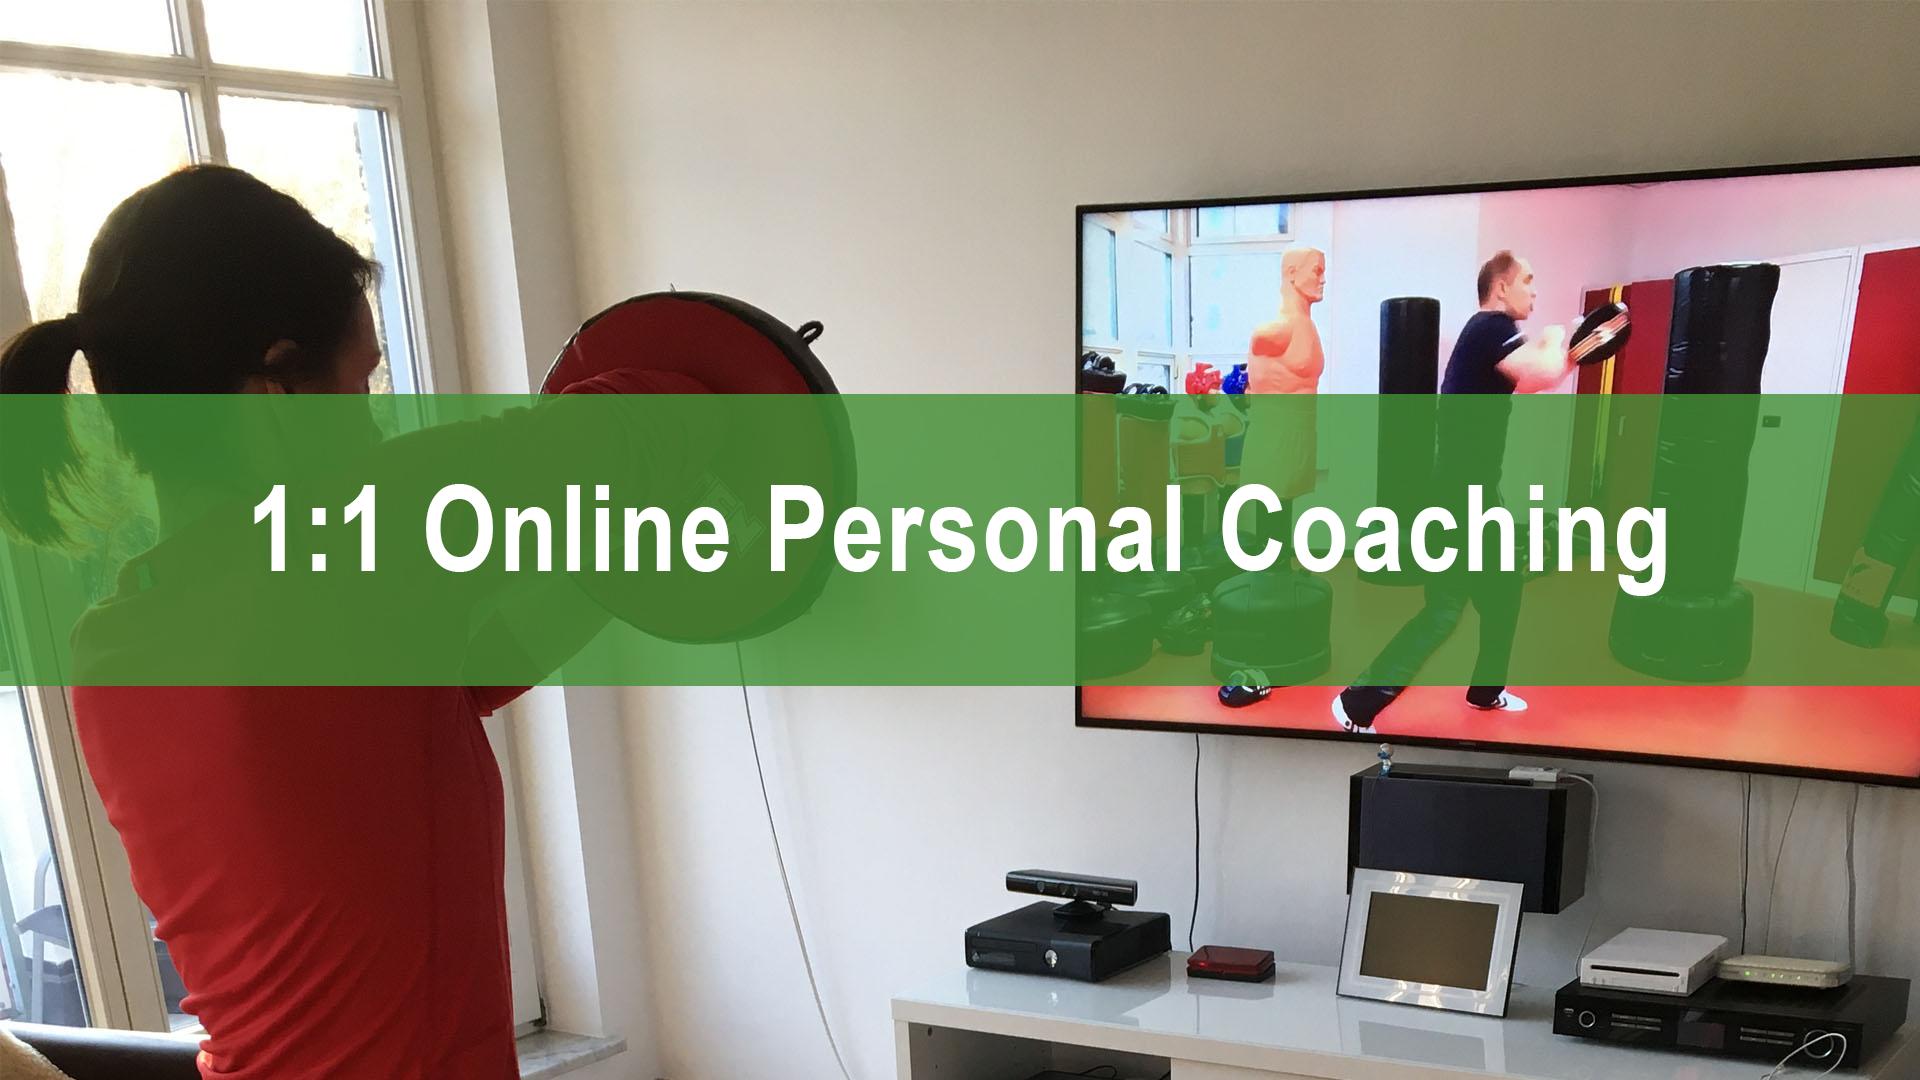 1:1 Selbstverteidigung Online Coaching - Marcel Descy